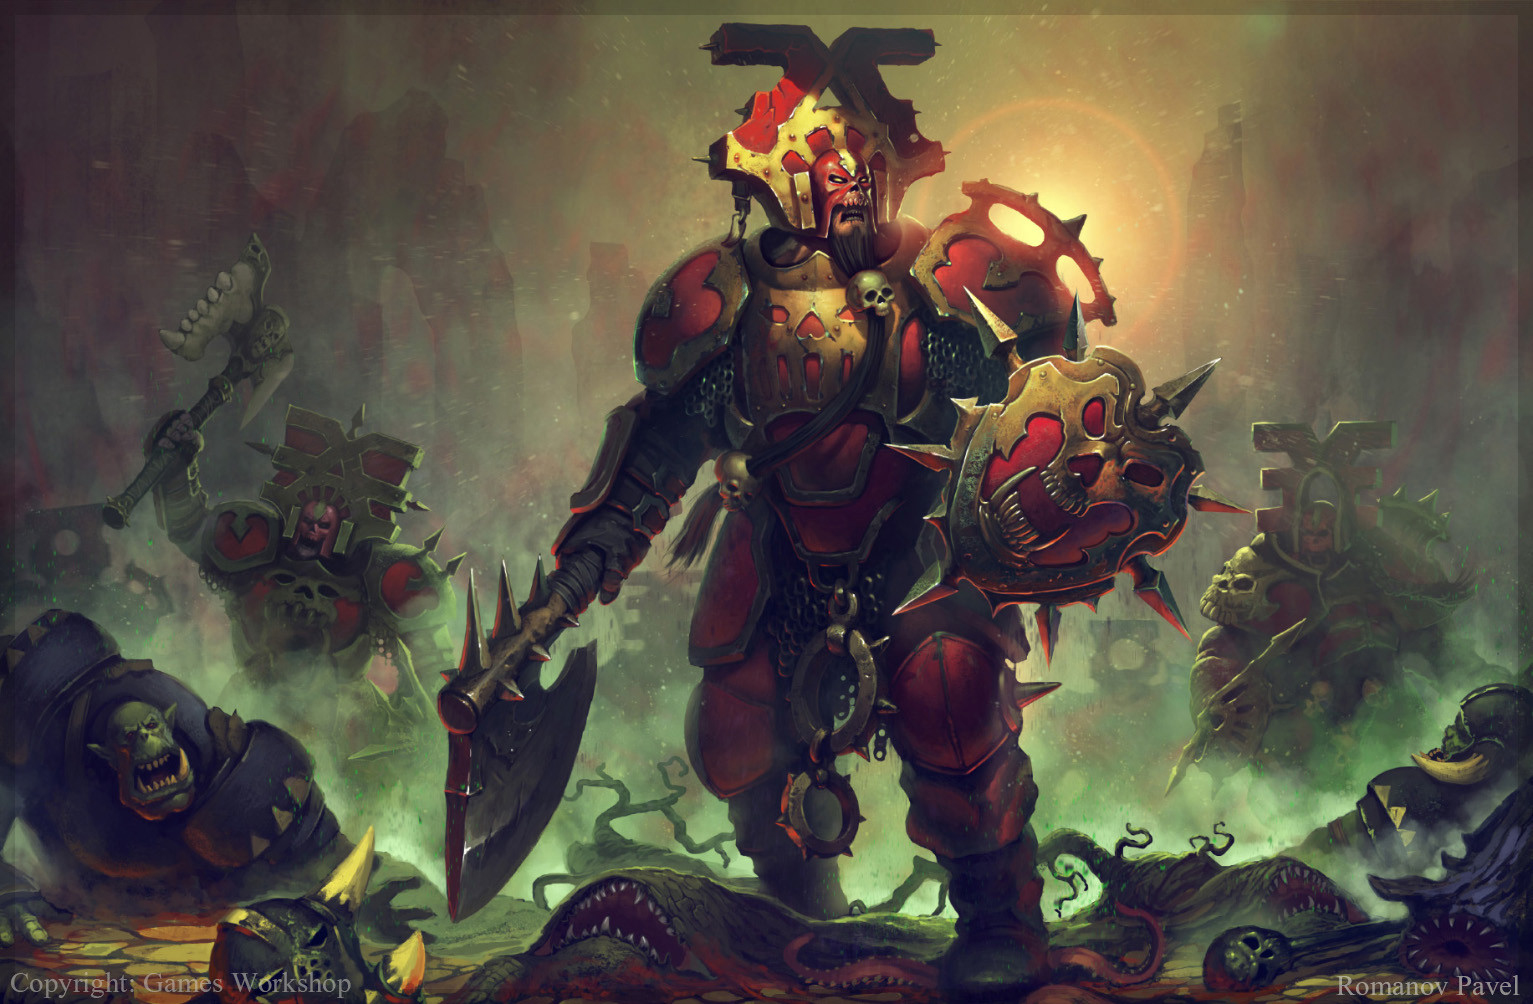 pavel-romanov-bloodwarriors-final-correct.jpg